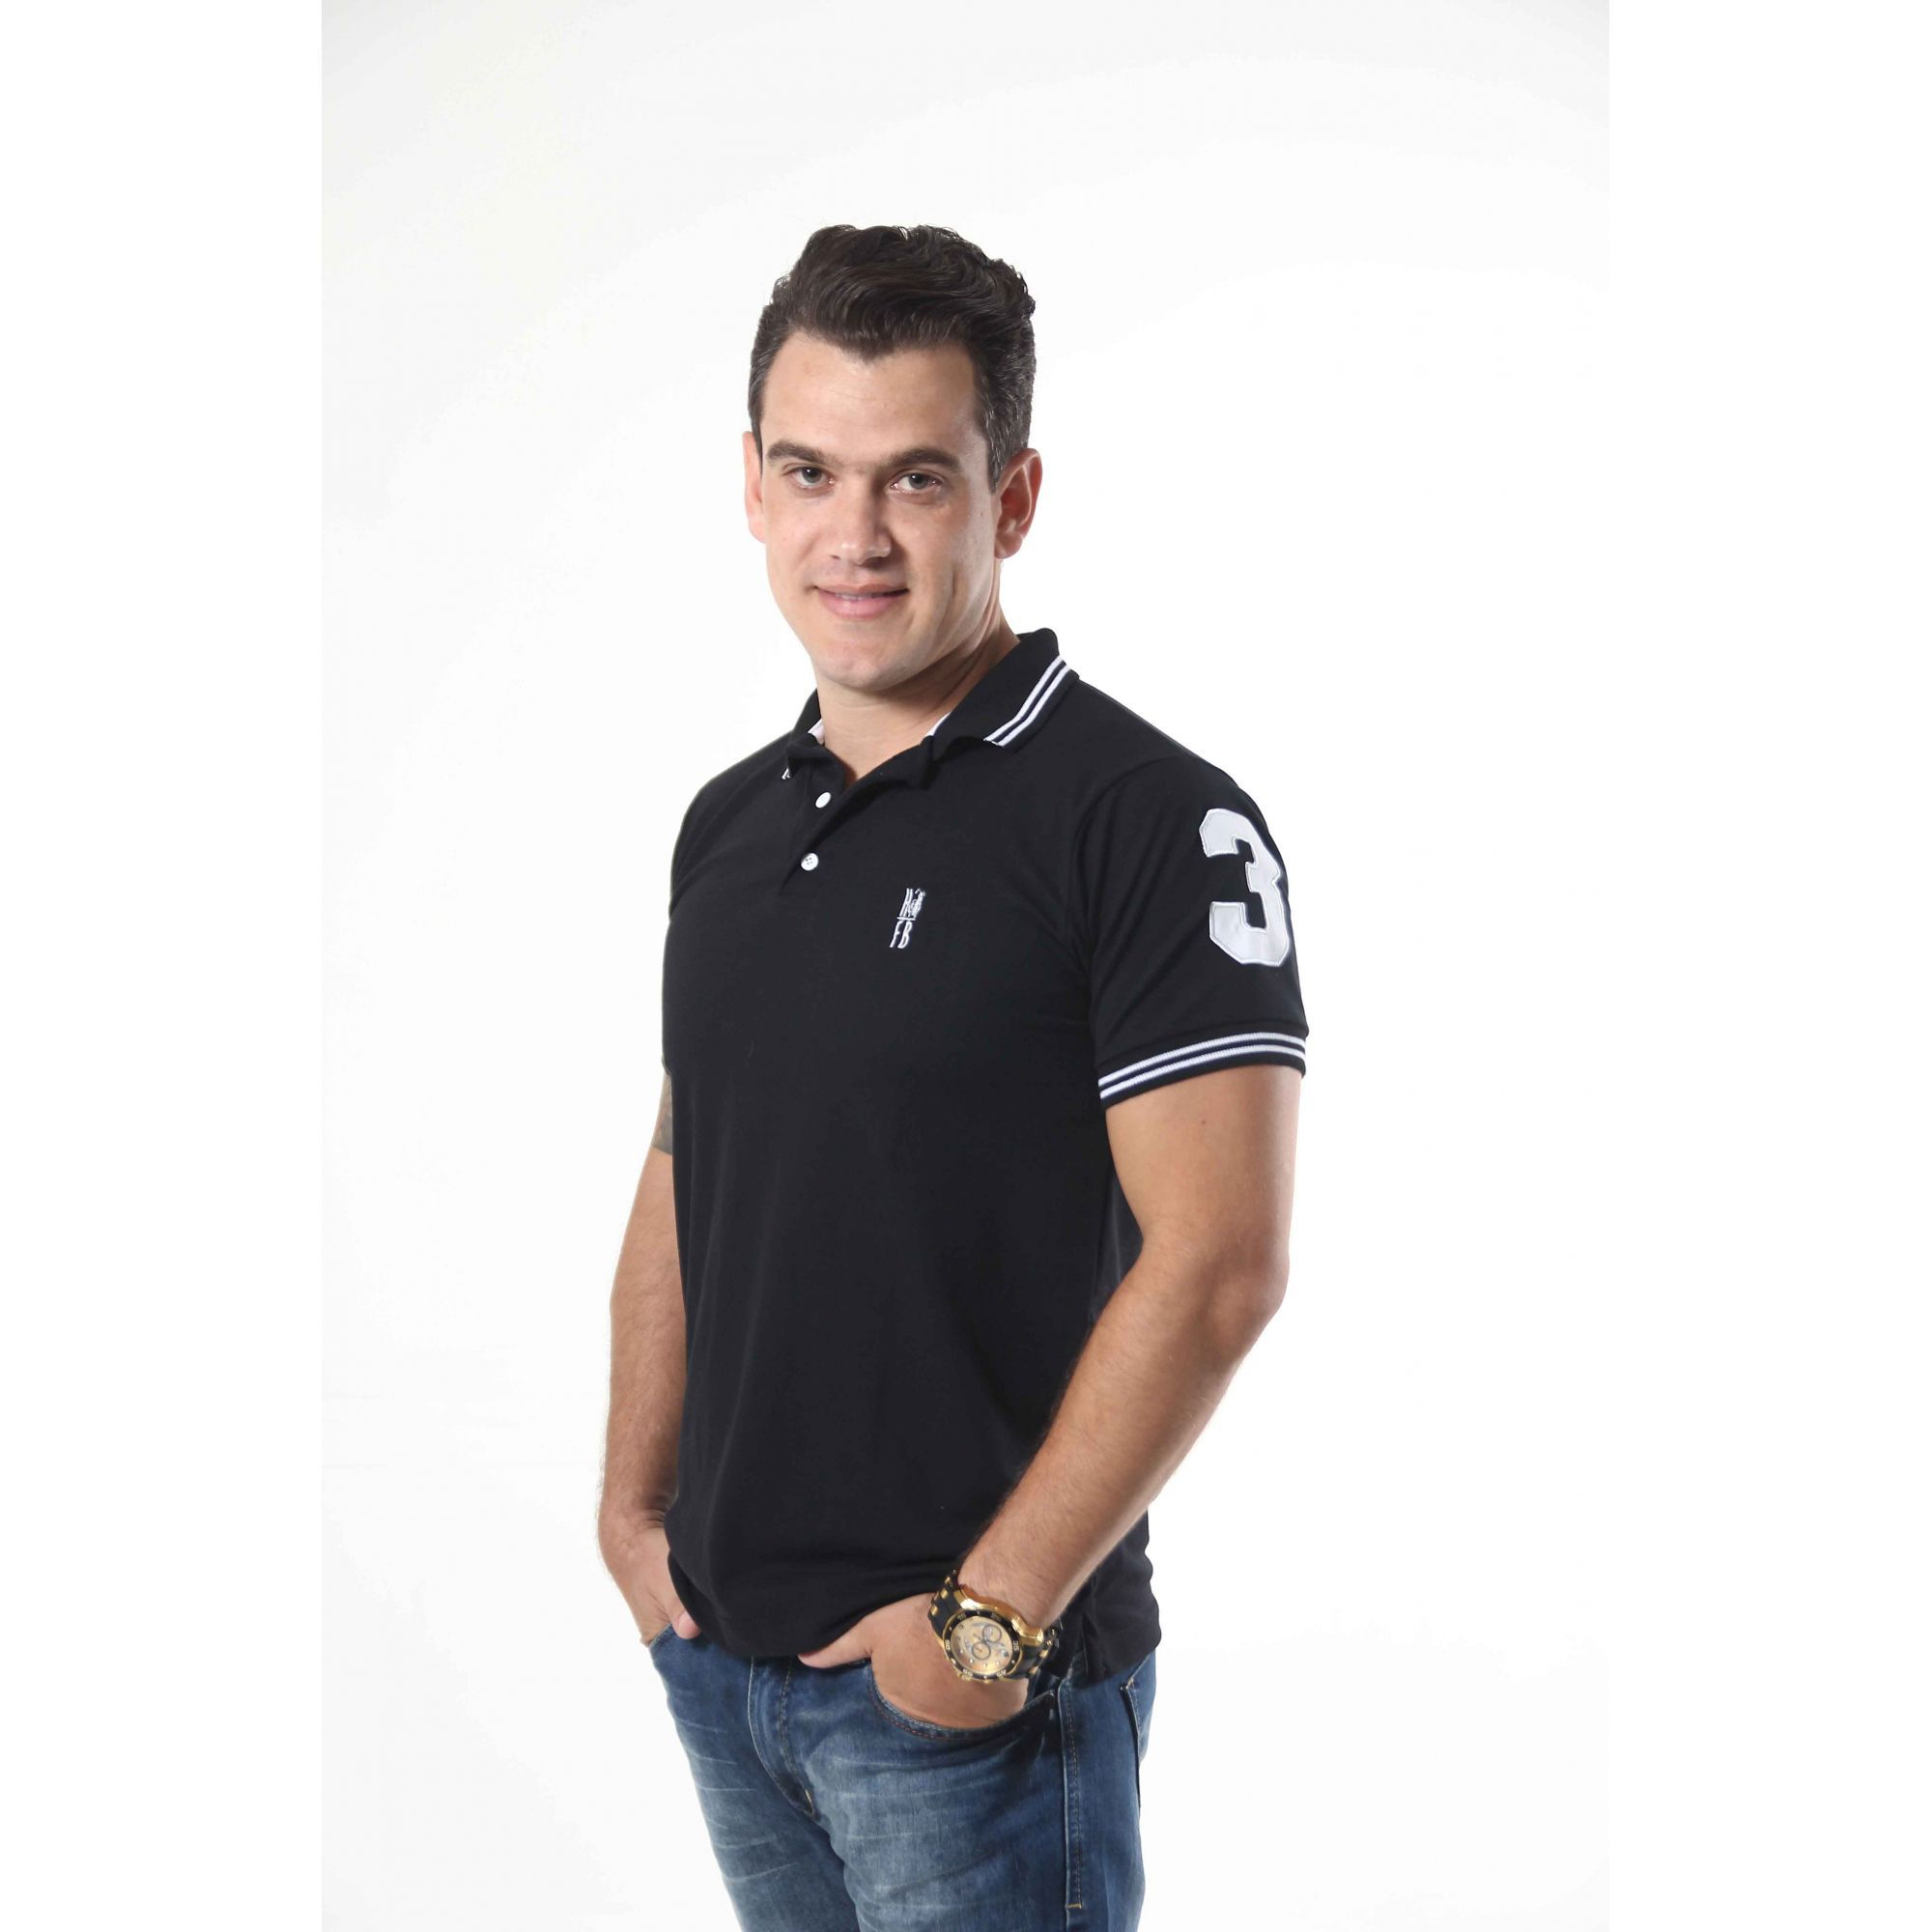 Camisa Polo Preto Elegância  - Heitor Fashion Brazil